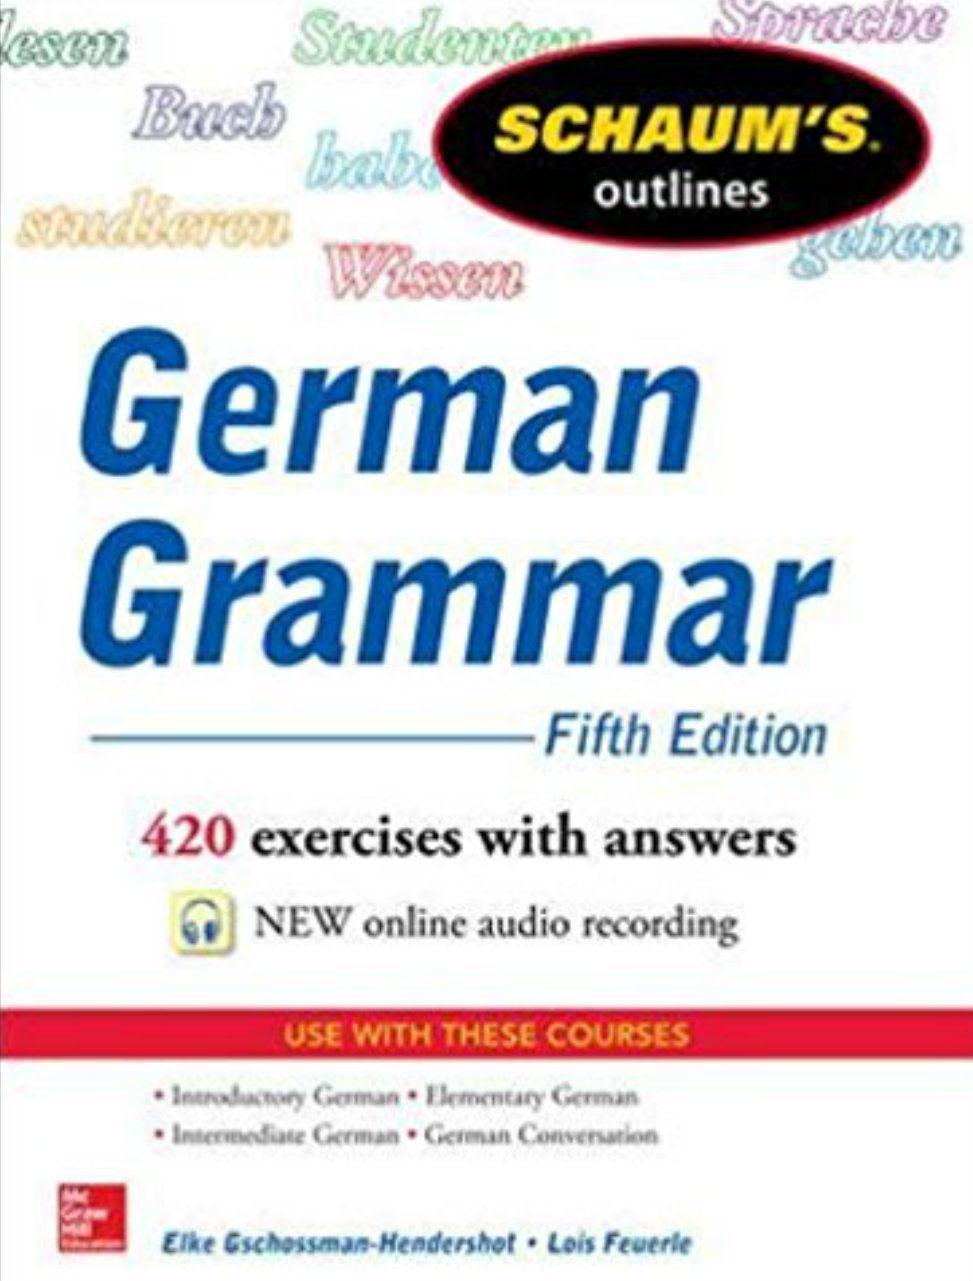 Schaum's Outlines: German Grammar